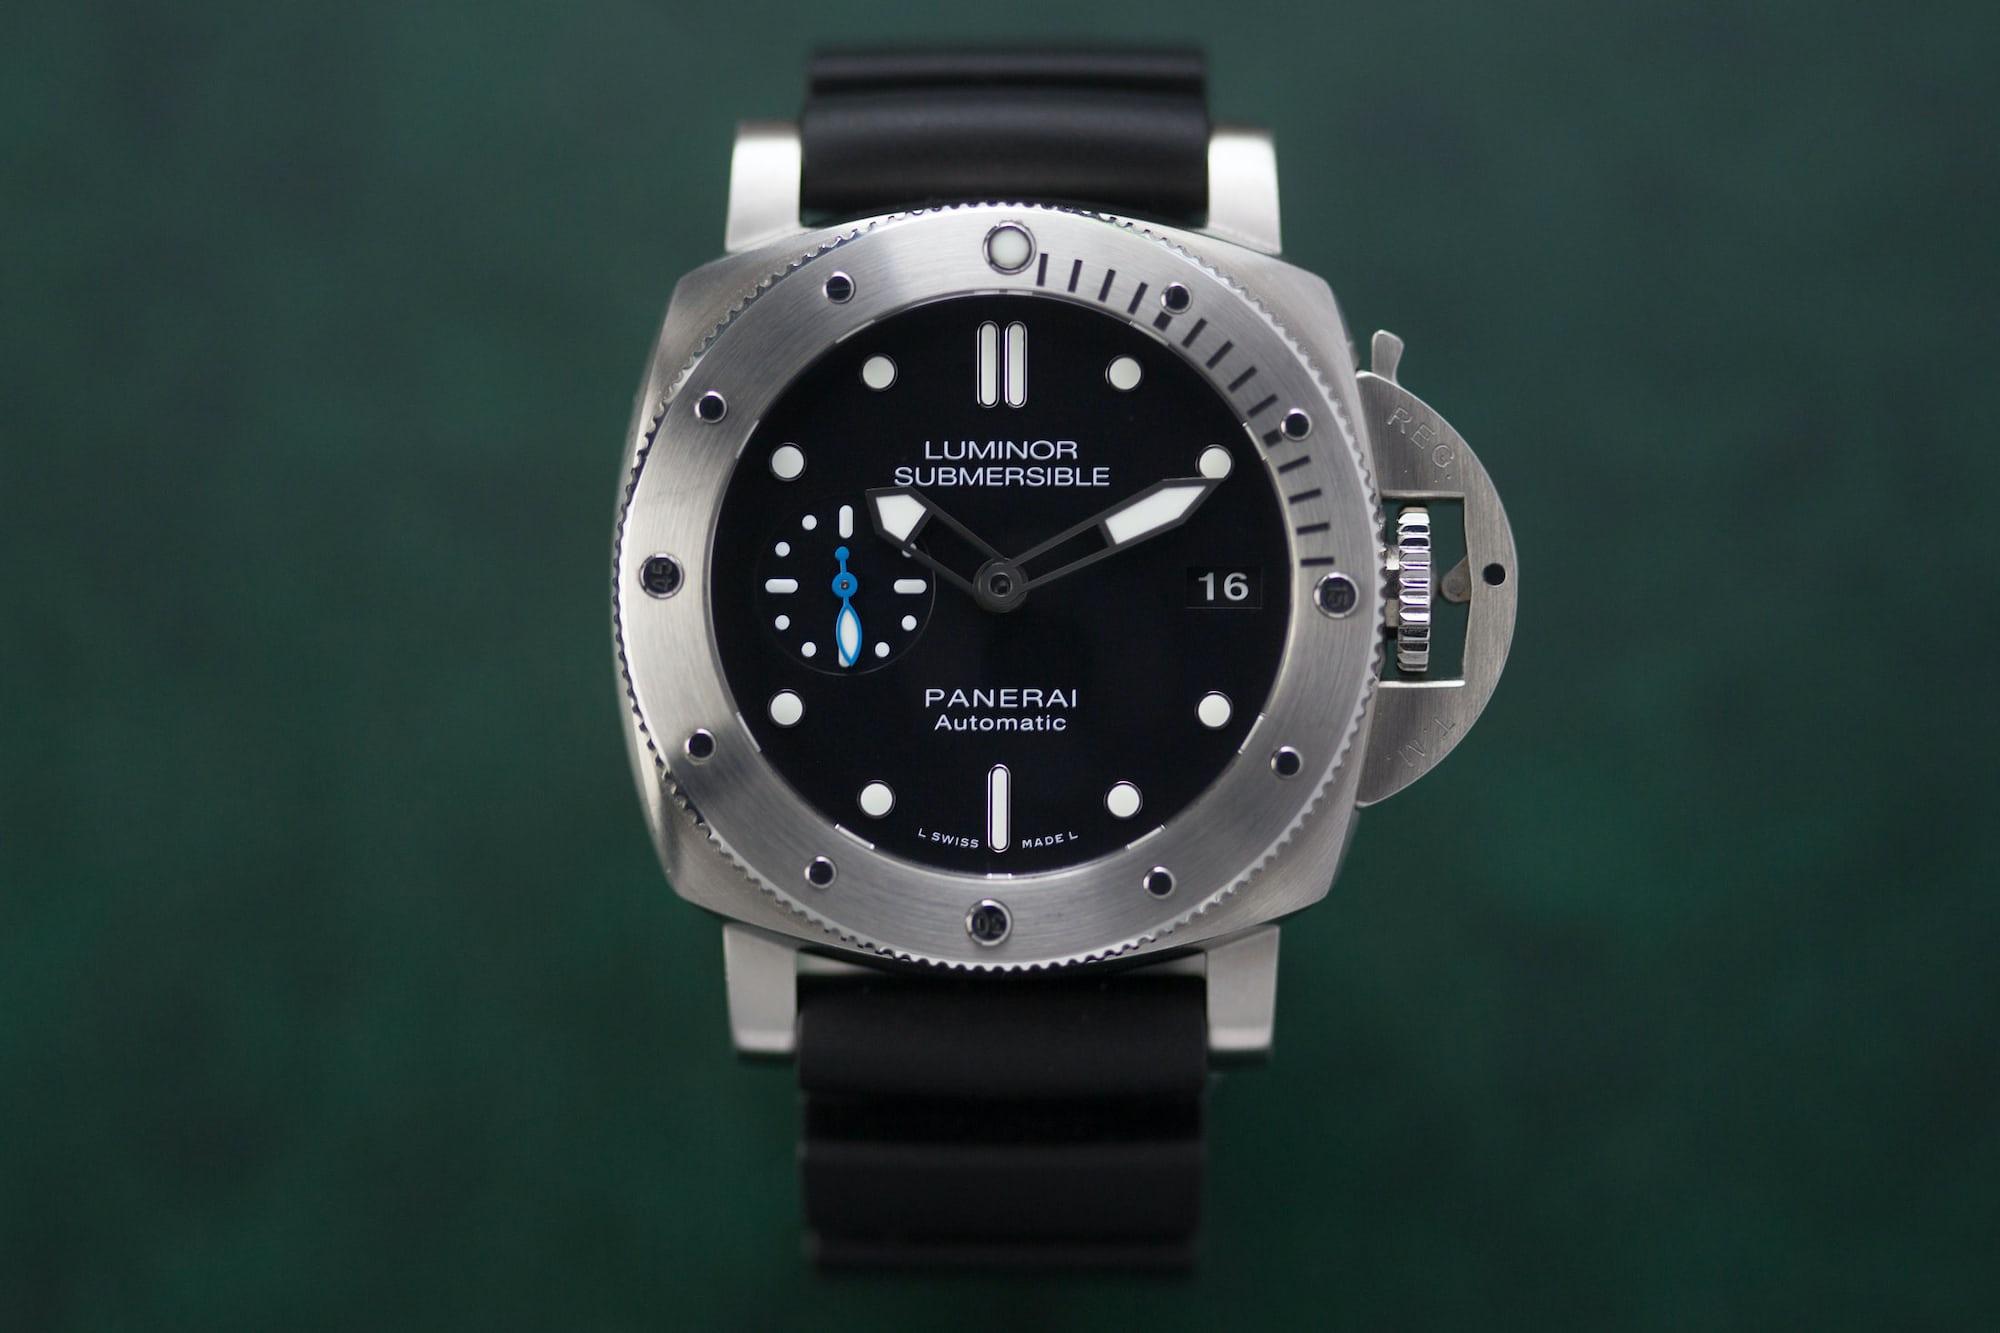 Hands on the panerai luminor submersible 1950 3 days - Panerai dive watch ...